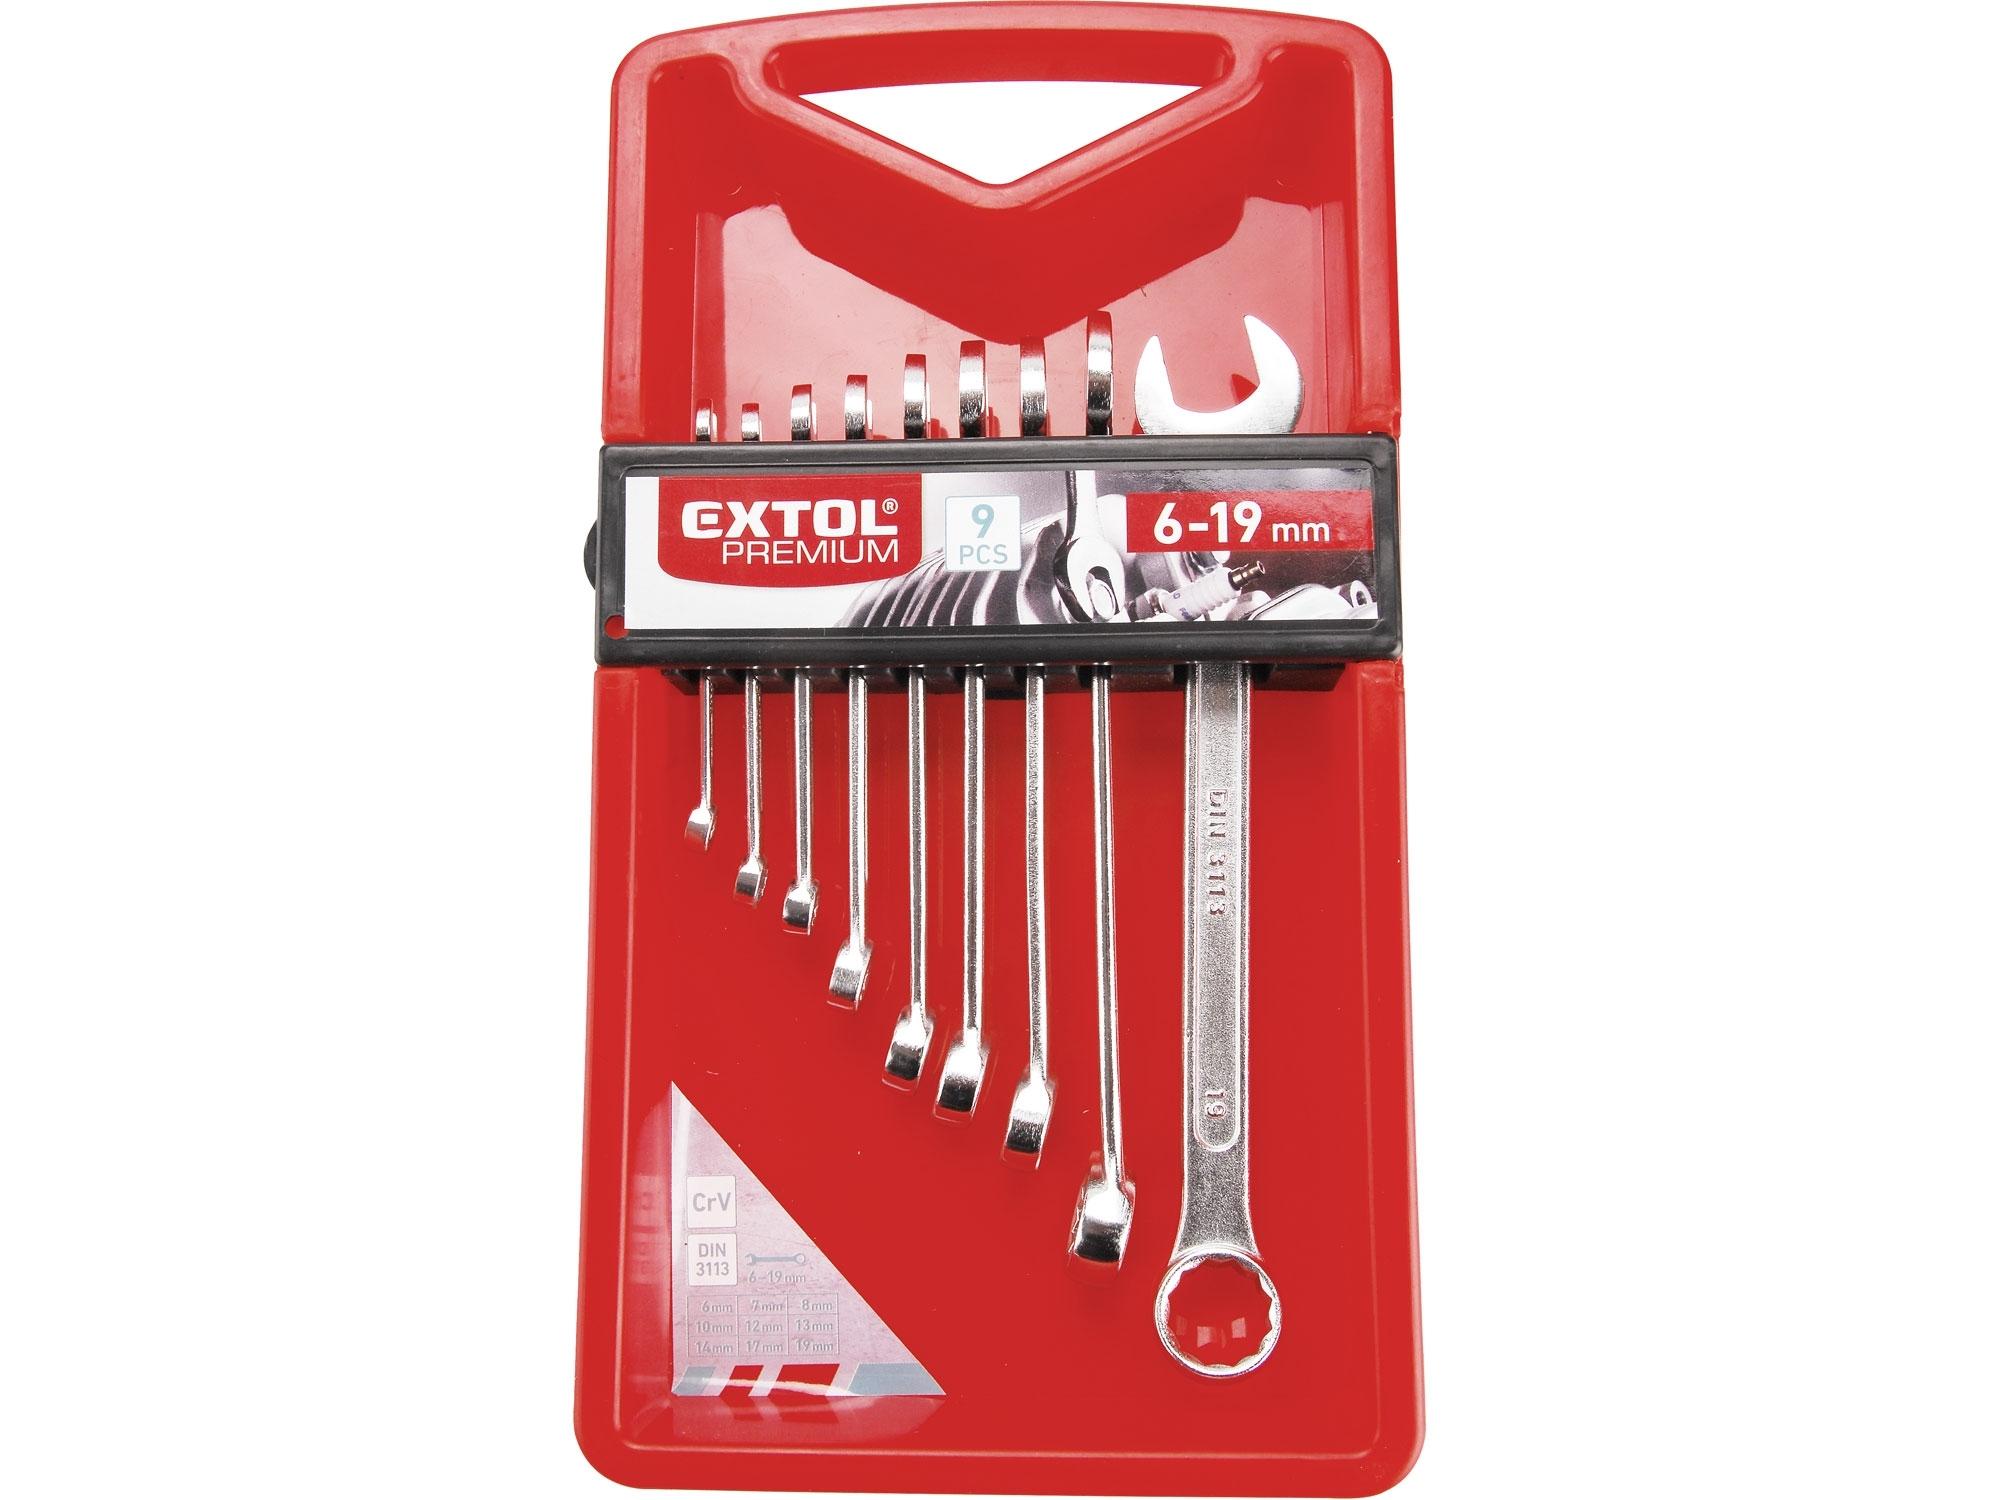 klíče očkoploché, sada 9ks, 6-19mm, EXTOL PREMIUM 6352